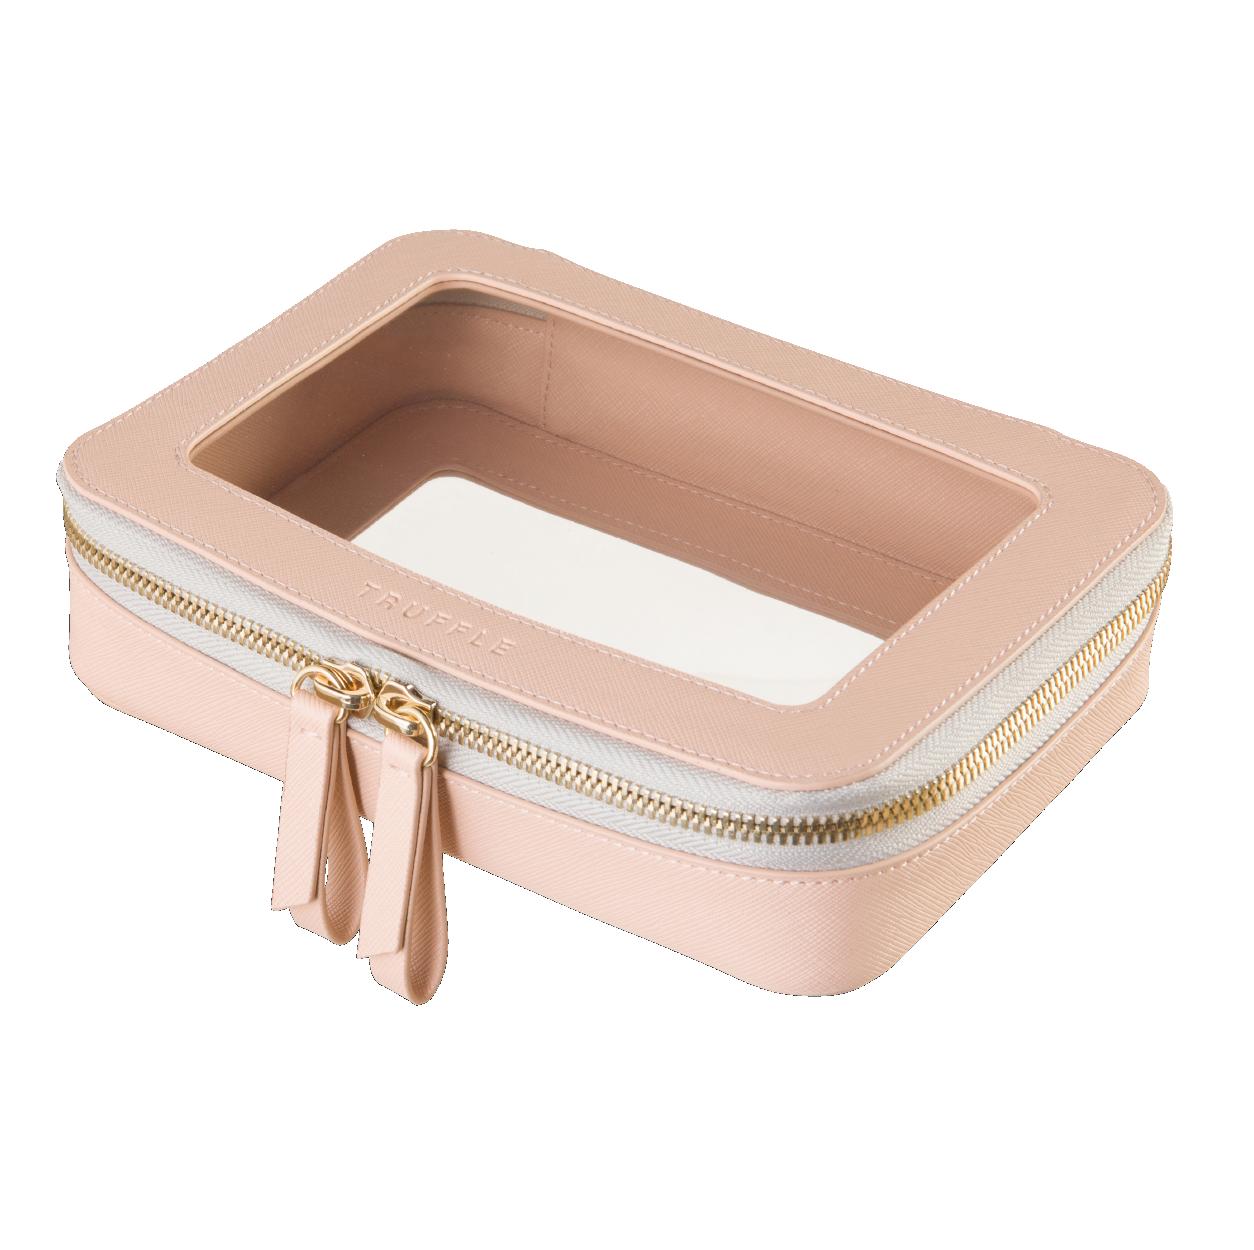 Truffle Clarity Jetset Cosmetics Case